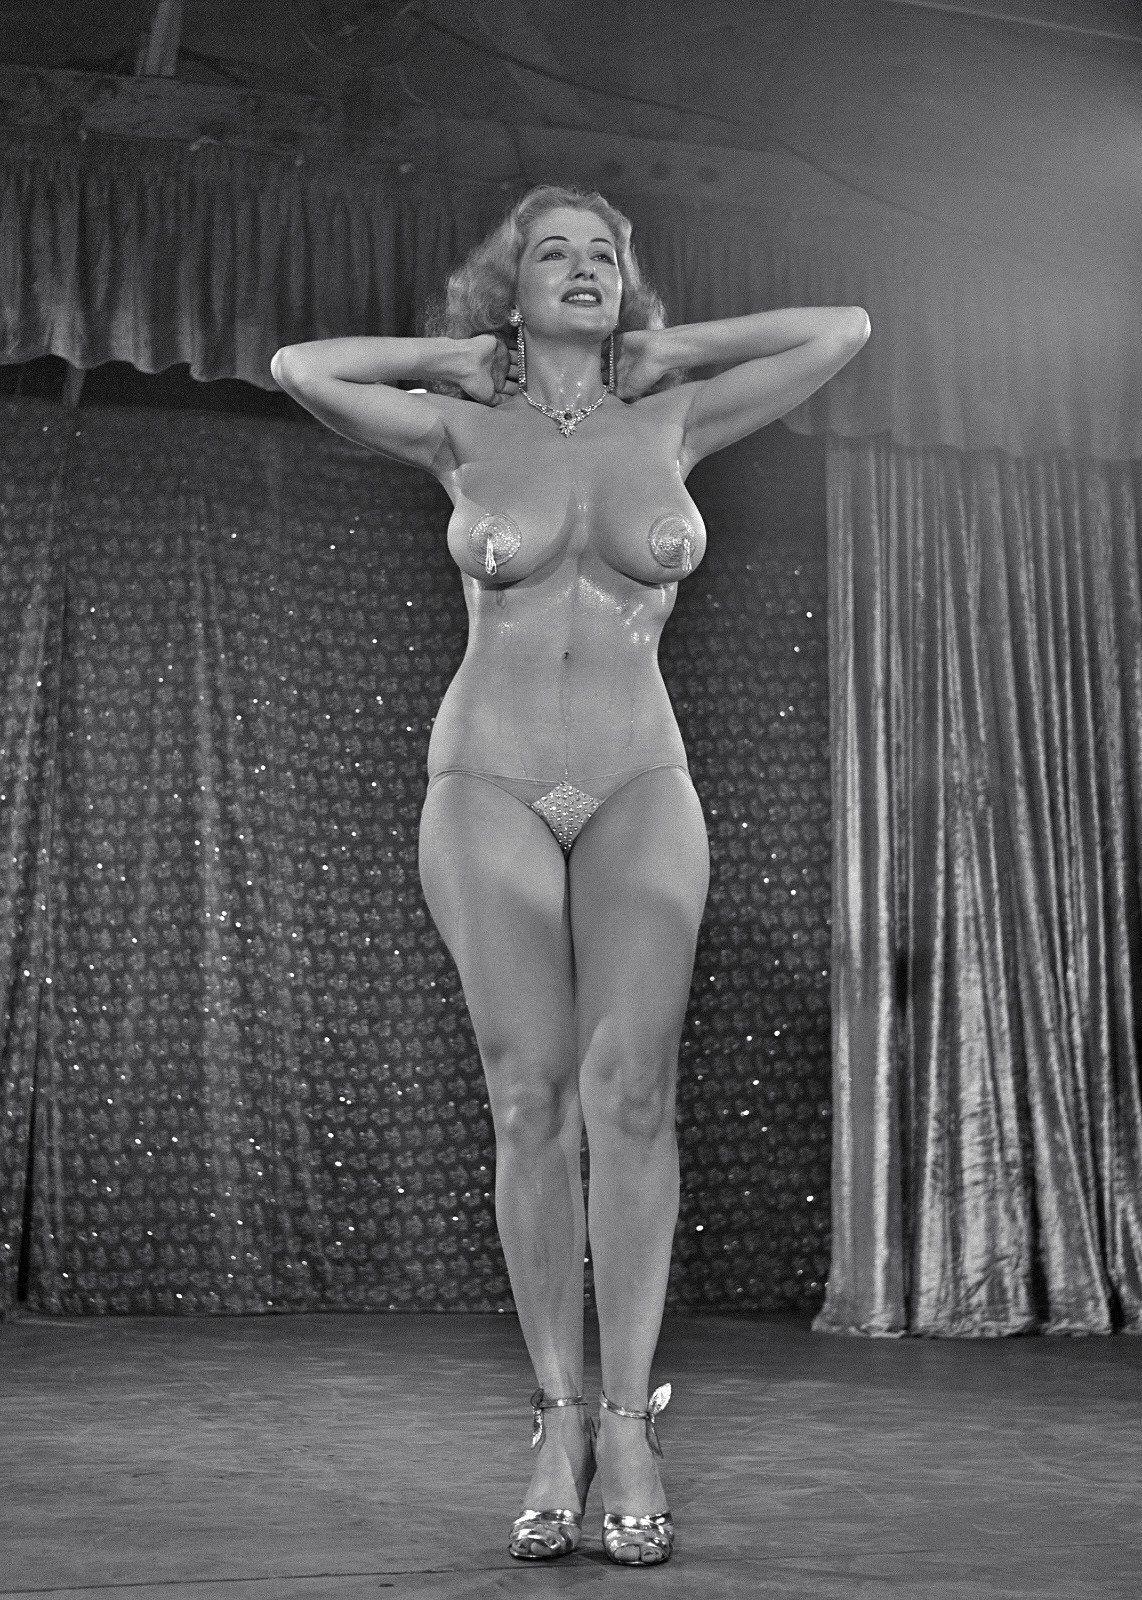 Burlesque stripper 1950s | Vintage Cool | Pinterest ...